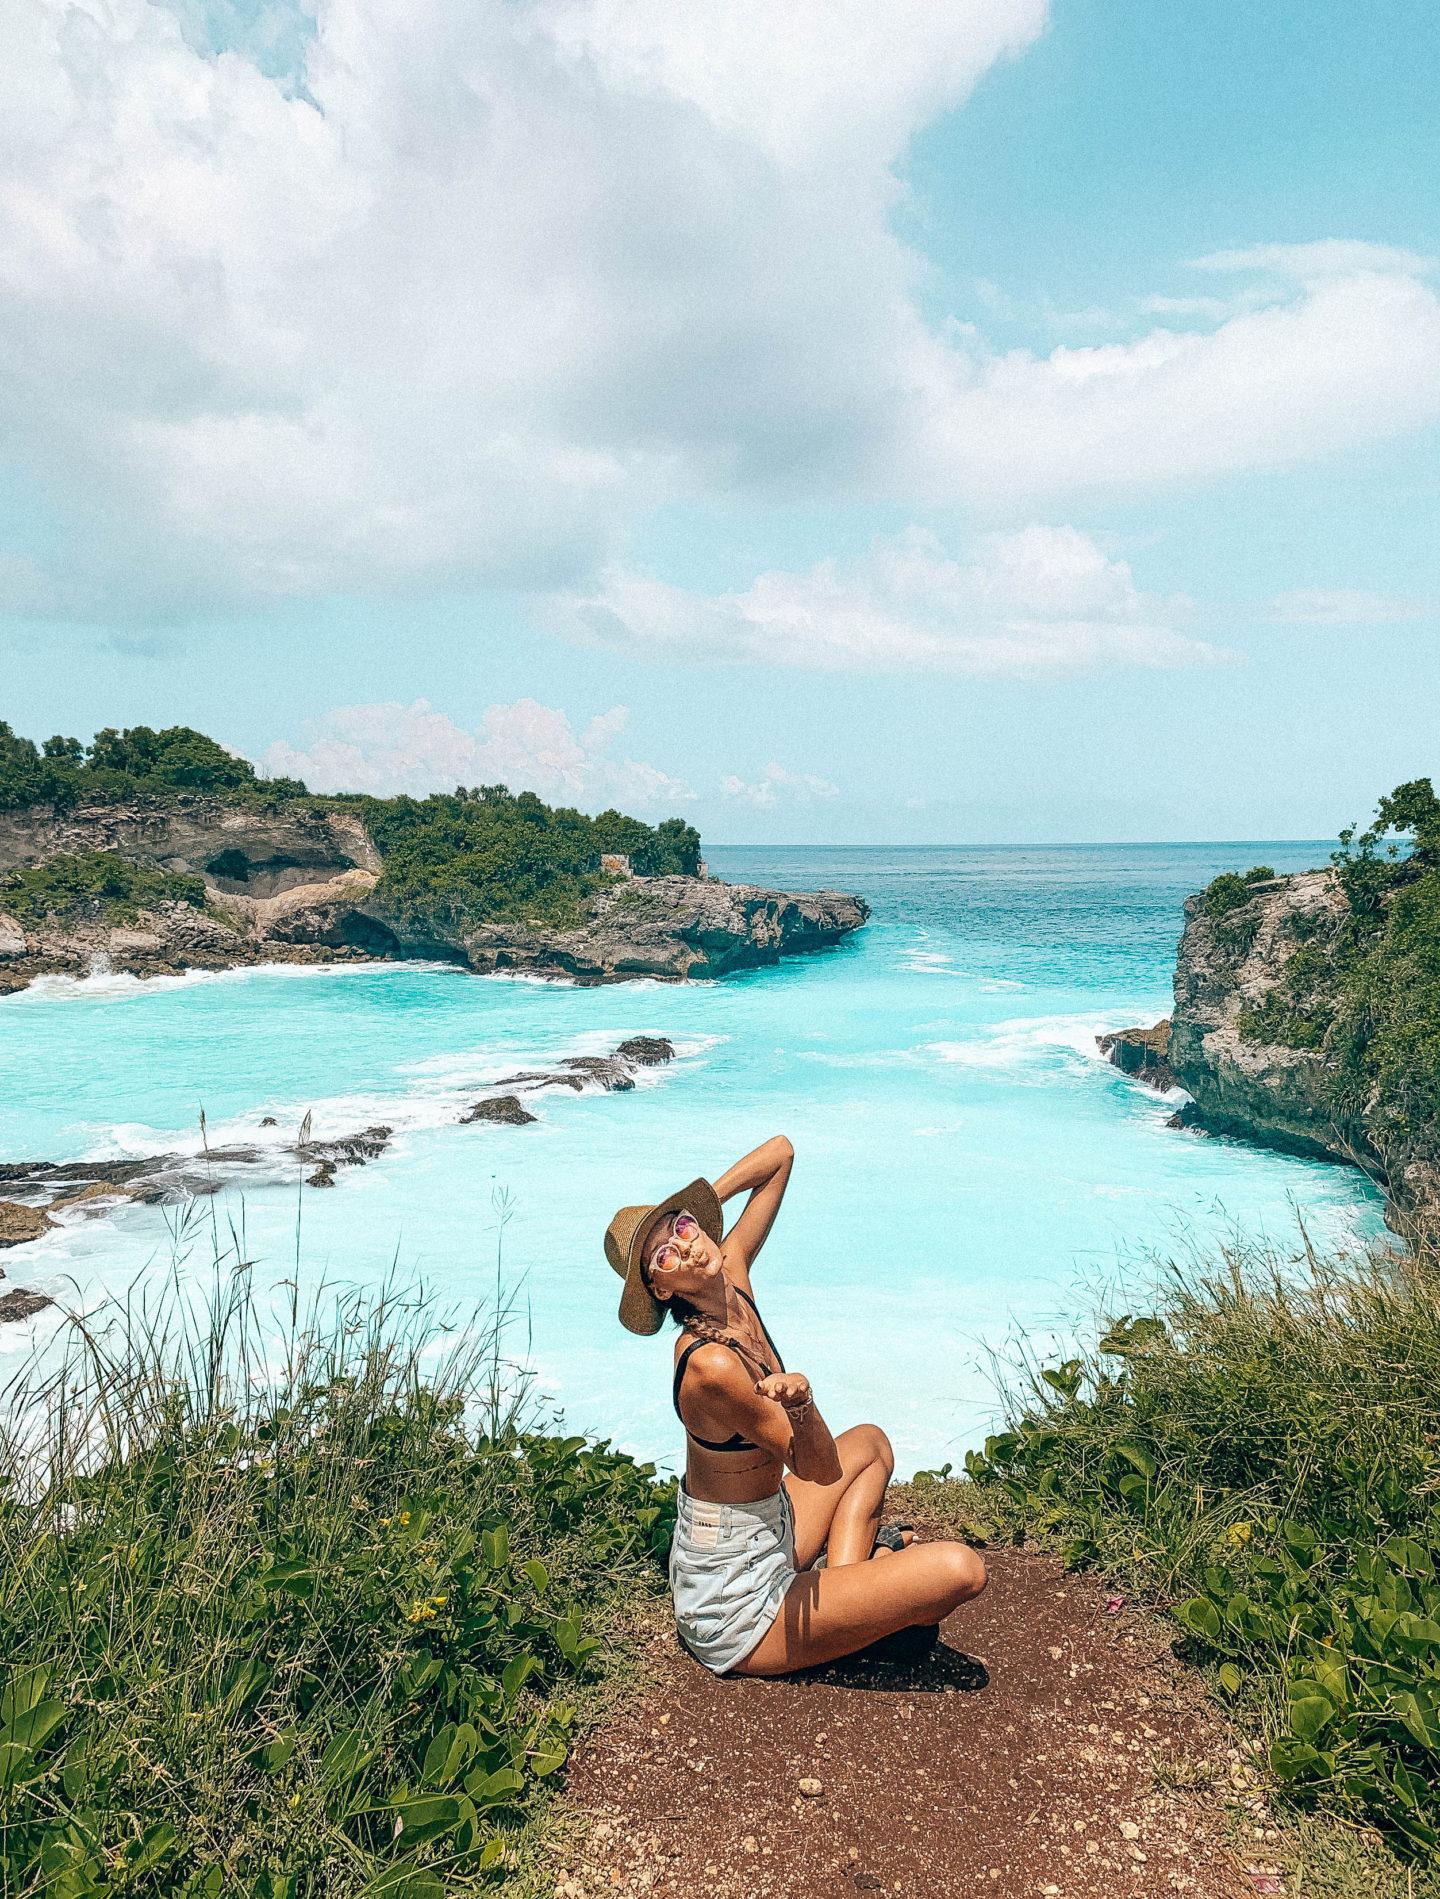 blue lagoon nusa penida nusa lembongan nusa ceningan bali trip travelling instagram spots brunettie cestovani indonesia